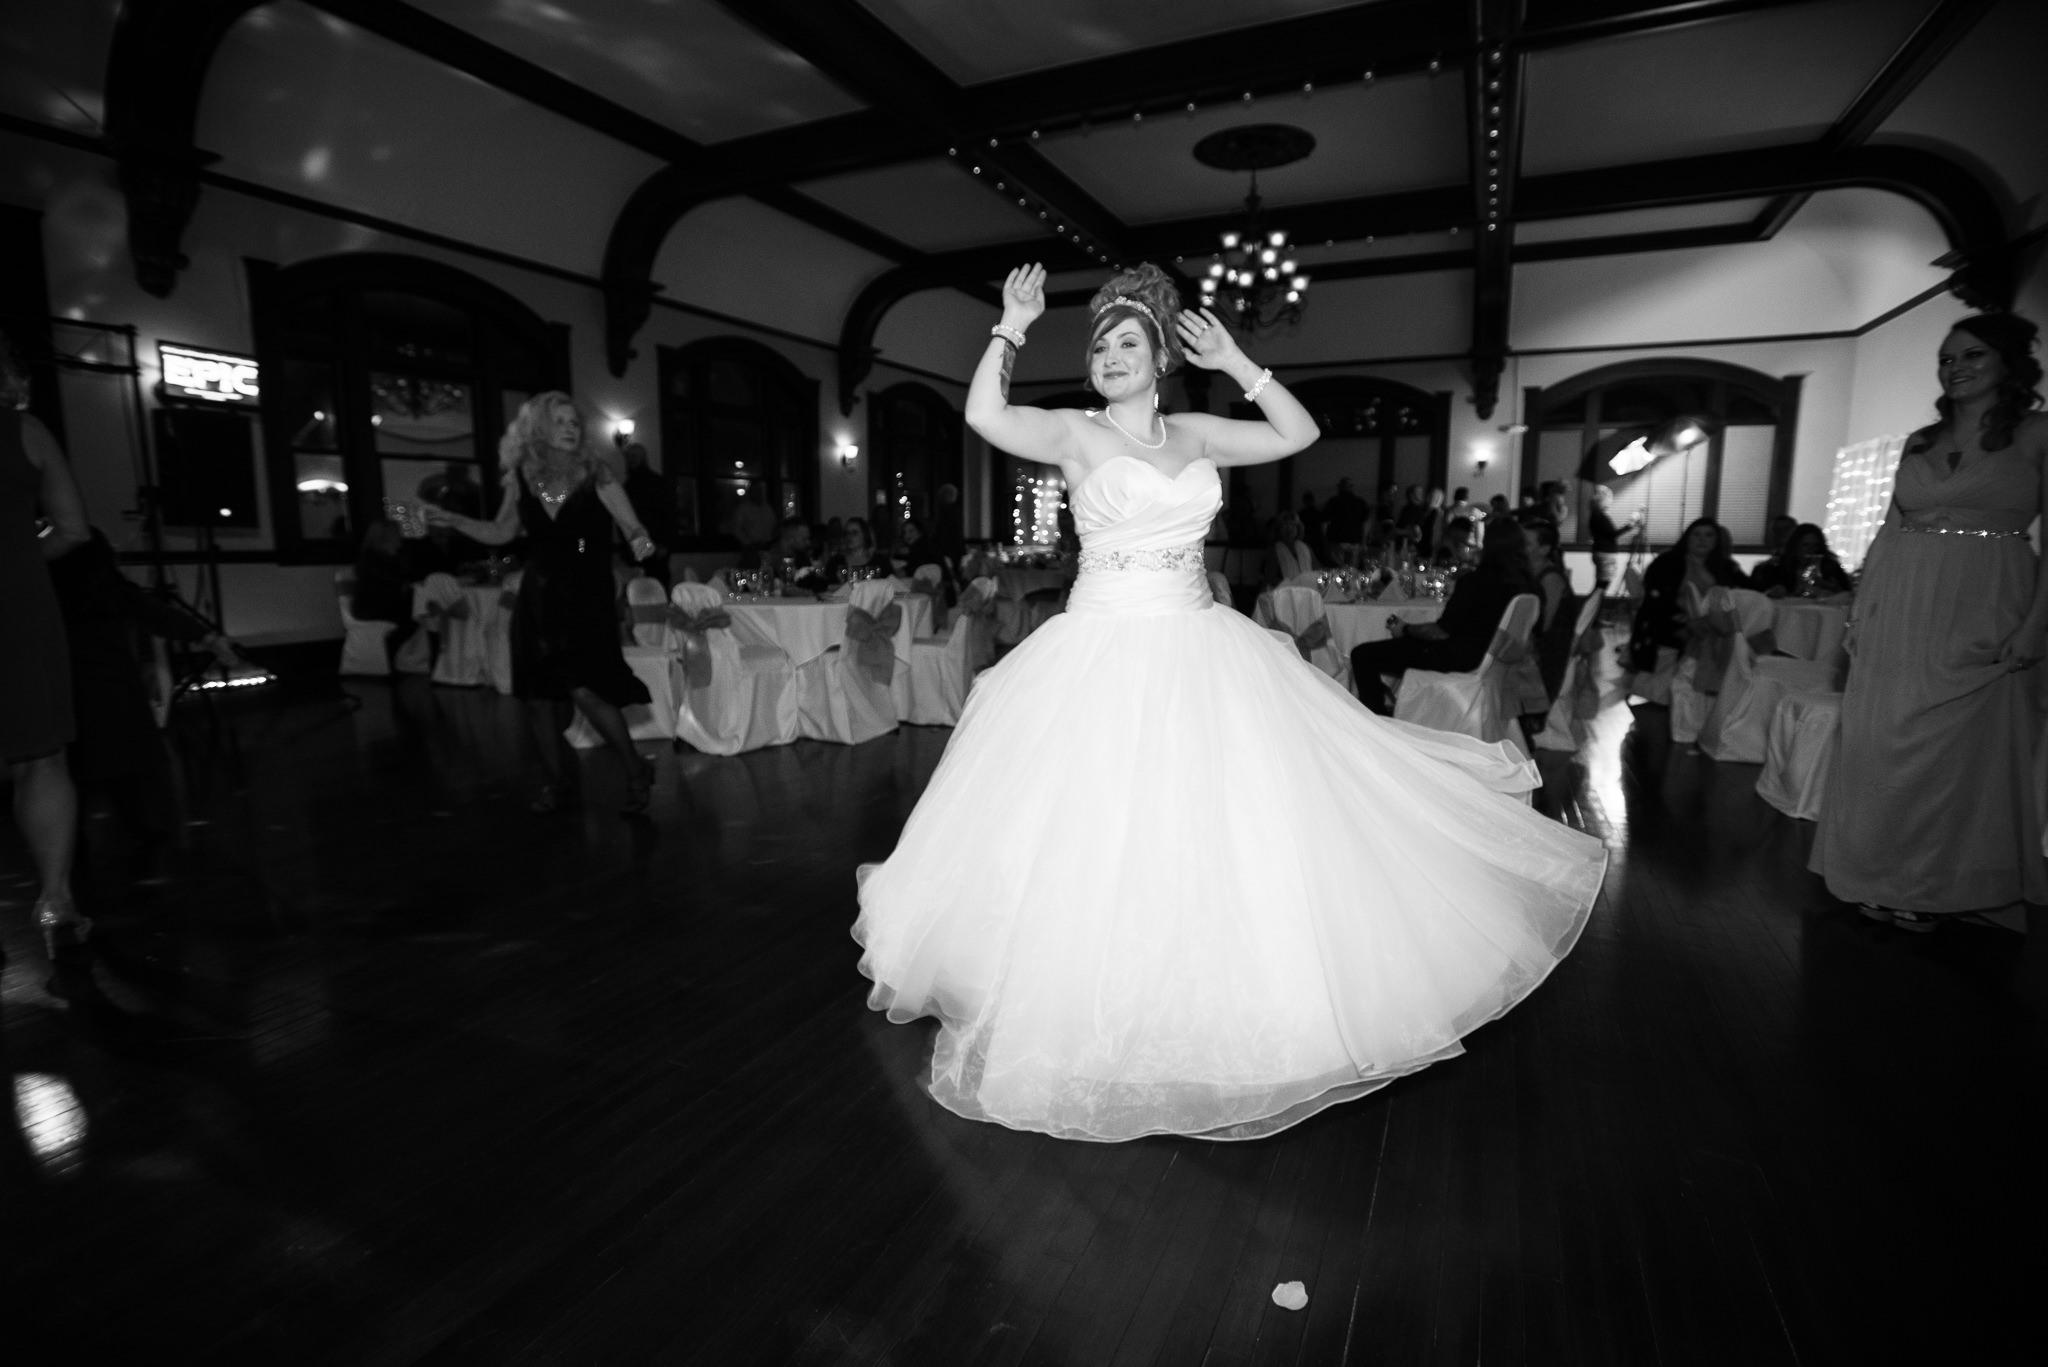 Grant Beachy Photo portrait wedding goshen elkhart south bend chicago-055.jpg